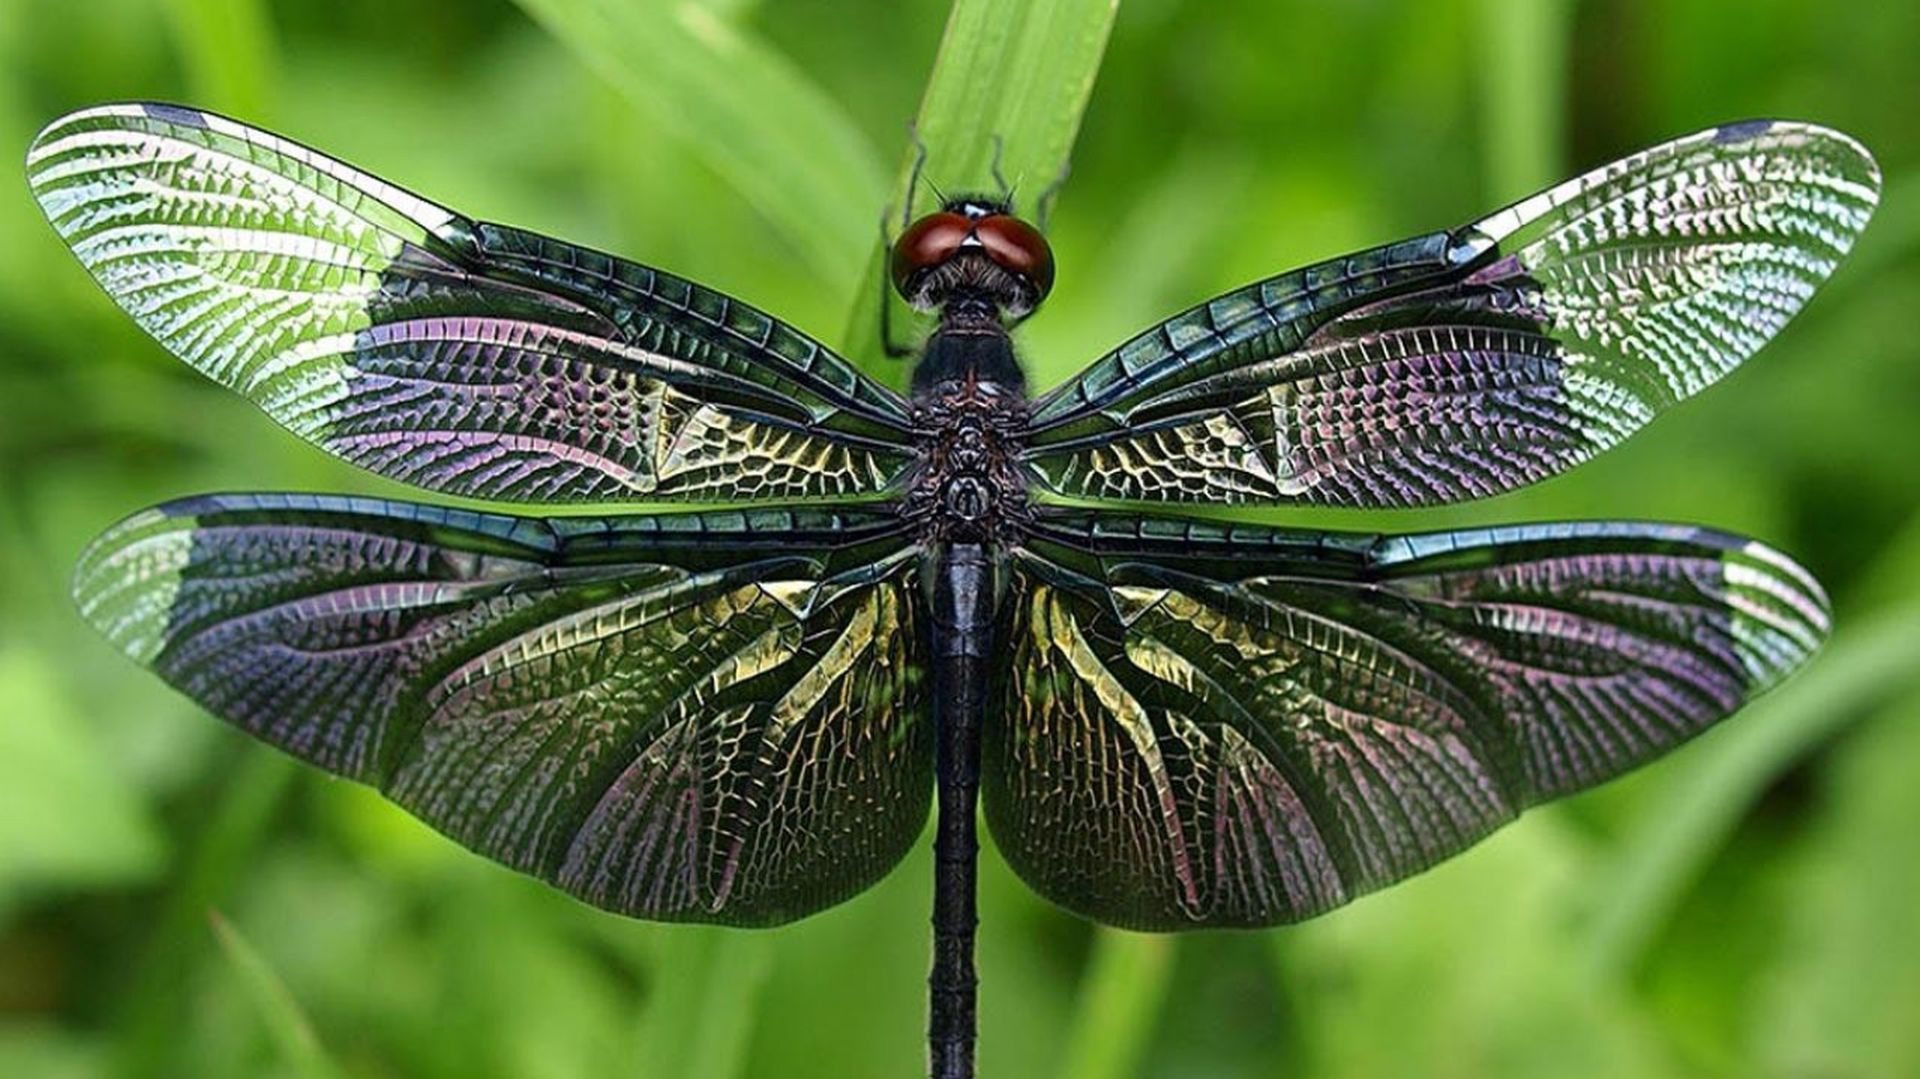 Beautiful Fall Wallpaper For Mobile Dragonfly Wallpapers Hd Pixelstalk Net